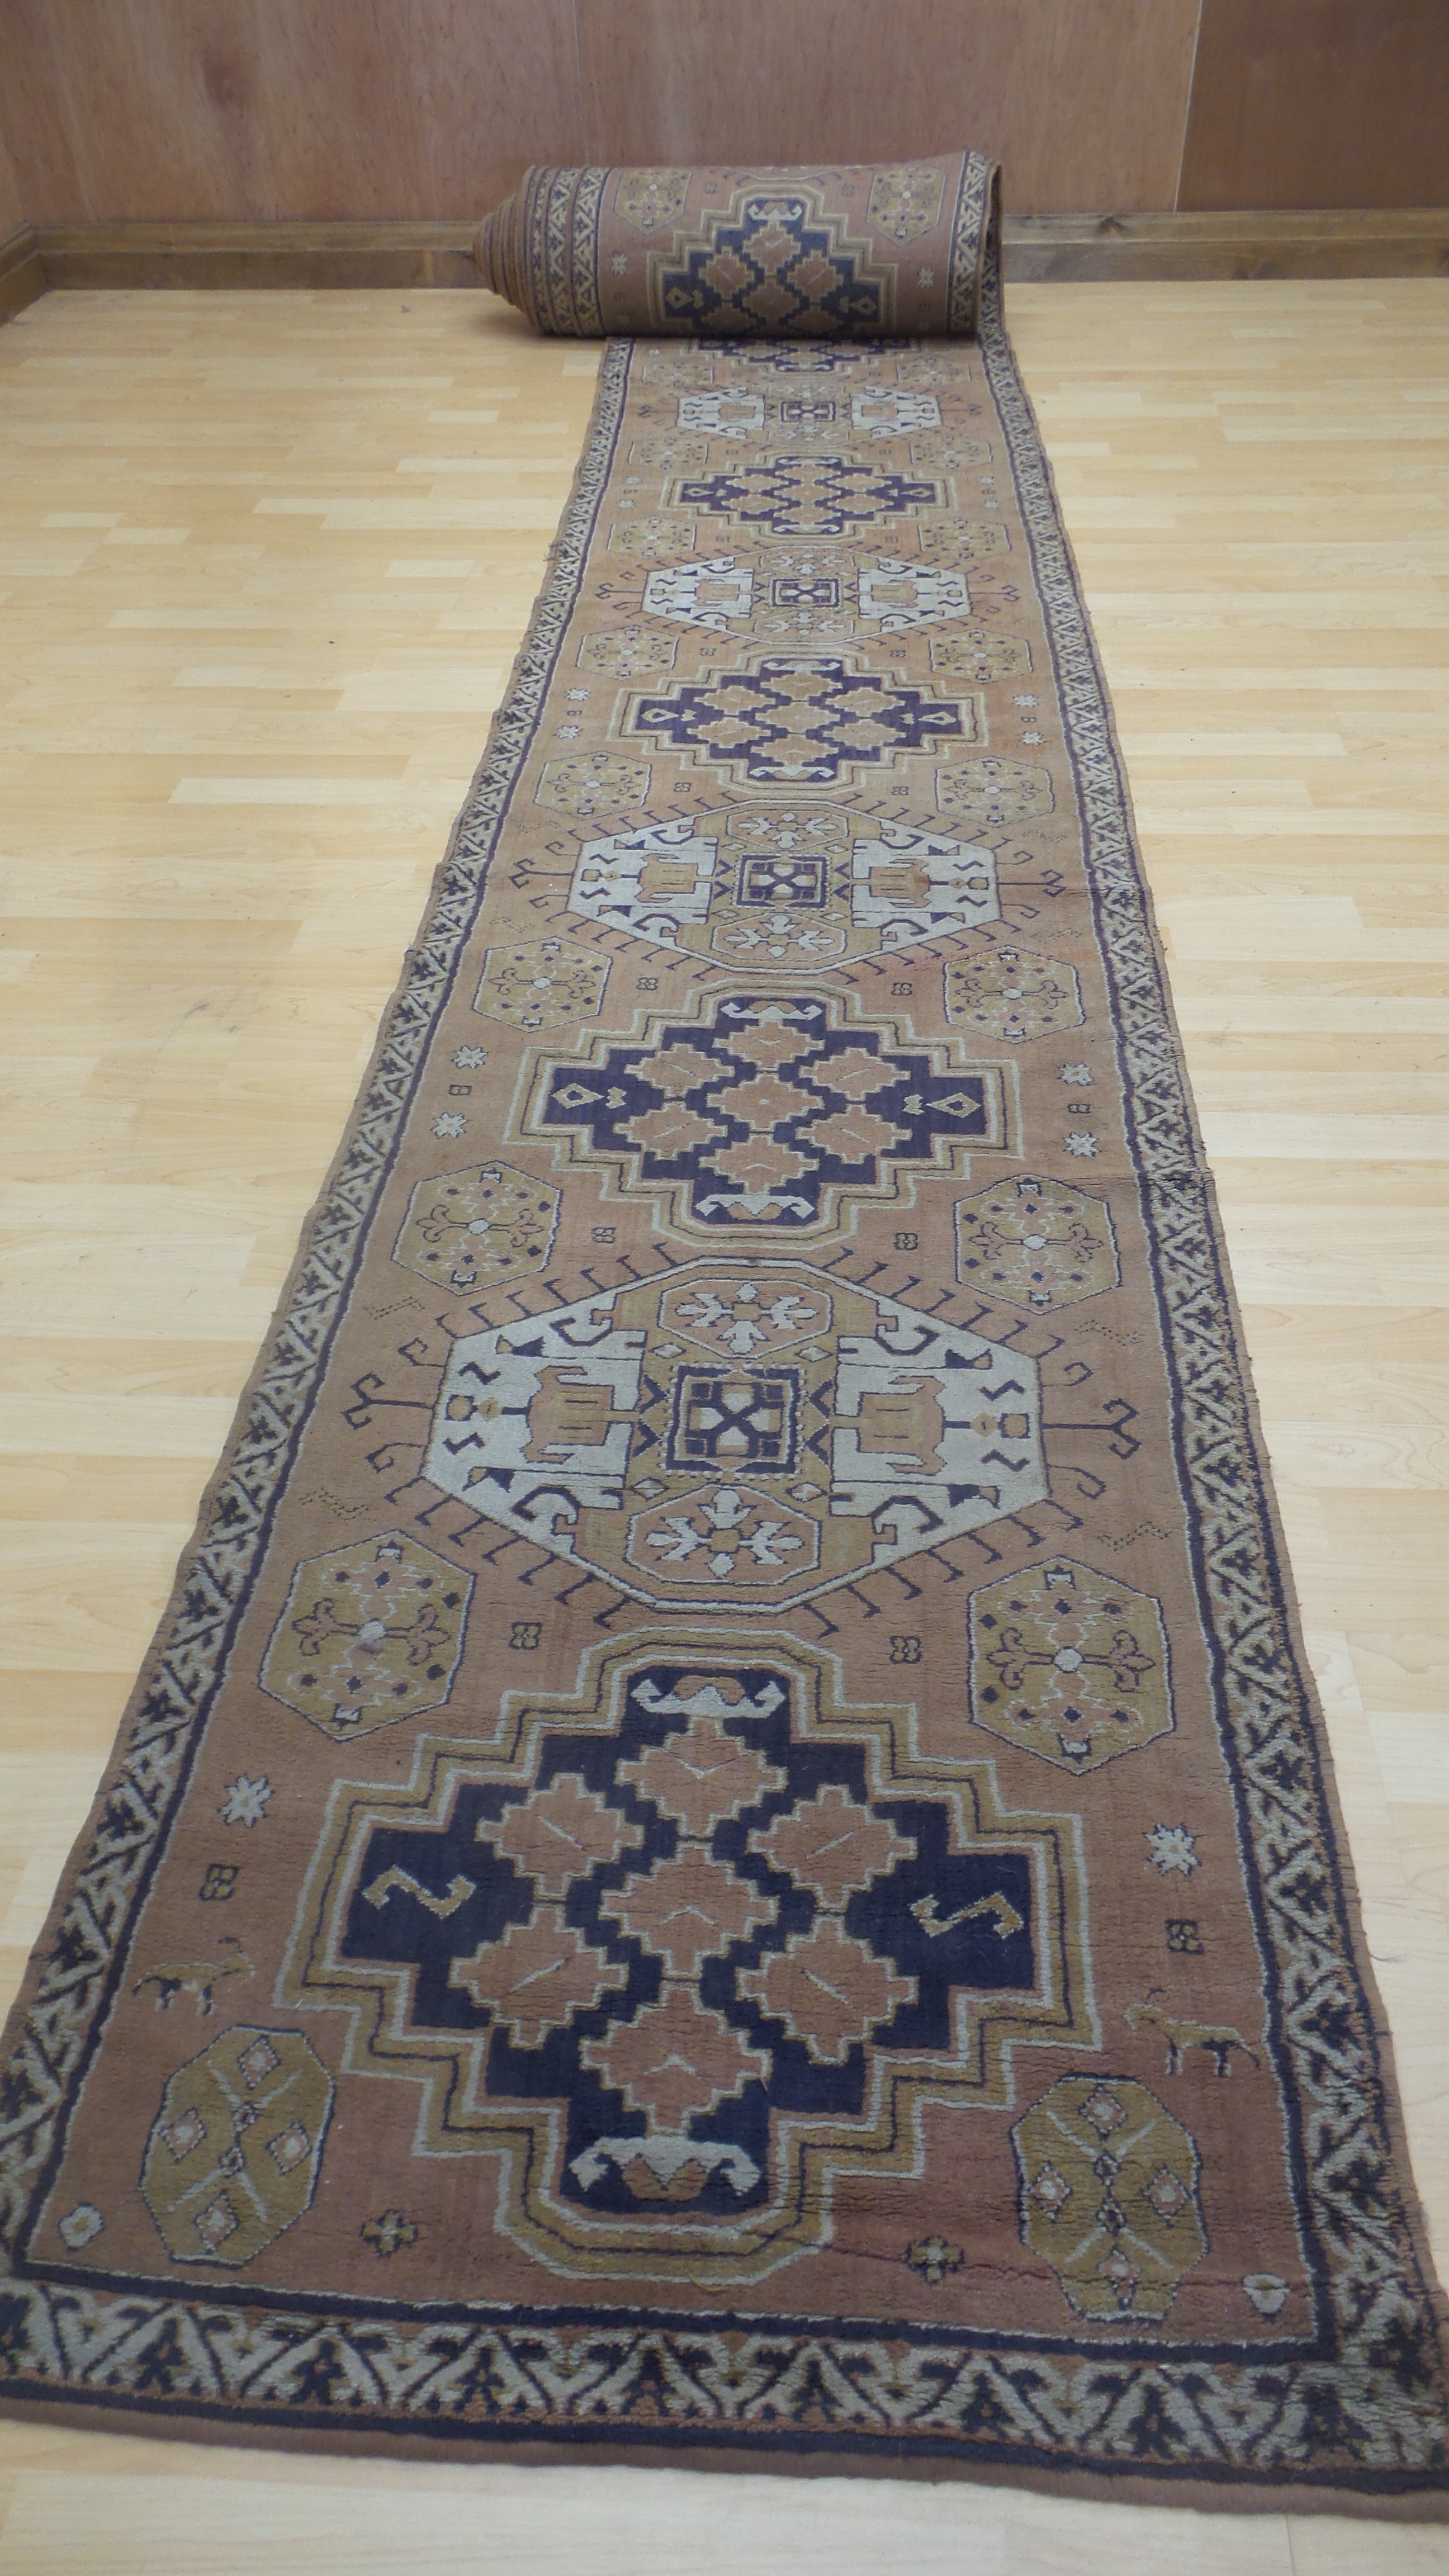 Incredibly Long Persian Design Stair Carpet Hall Runner Rug Oriental Design Tekke Scorpion 53 Feet Long Dating From 1940 S Tekke Turkmen Vinterior